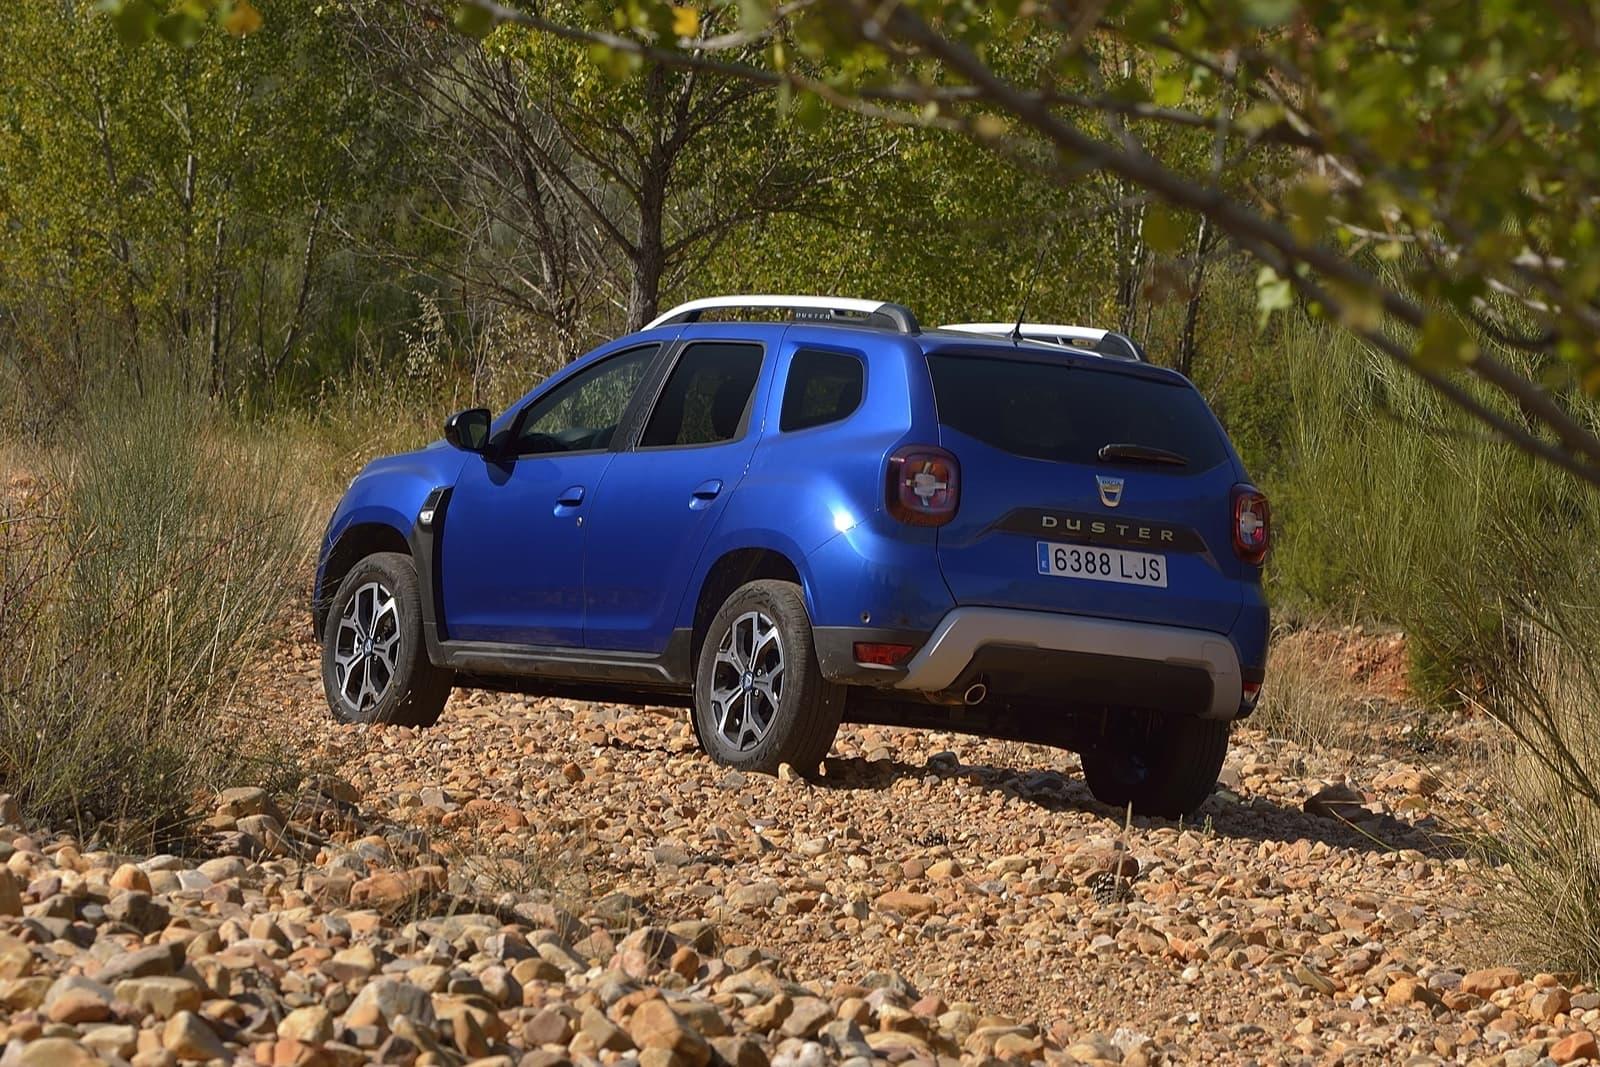 Dacia Duster Glp 1020 006